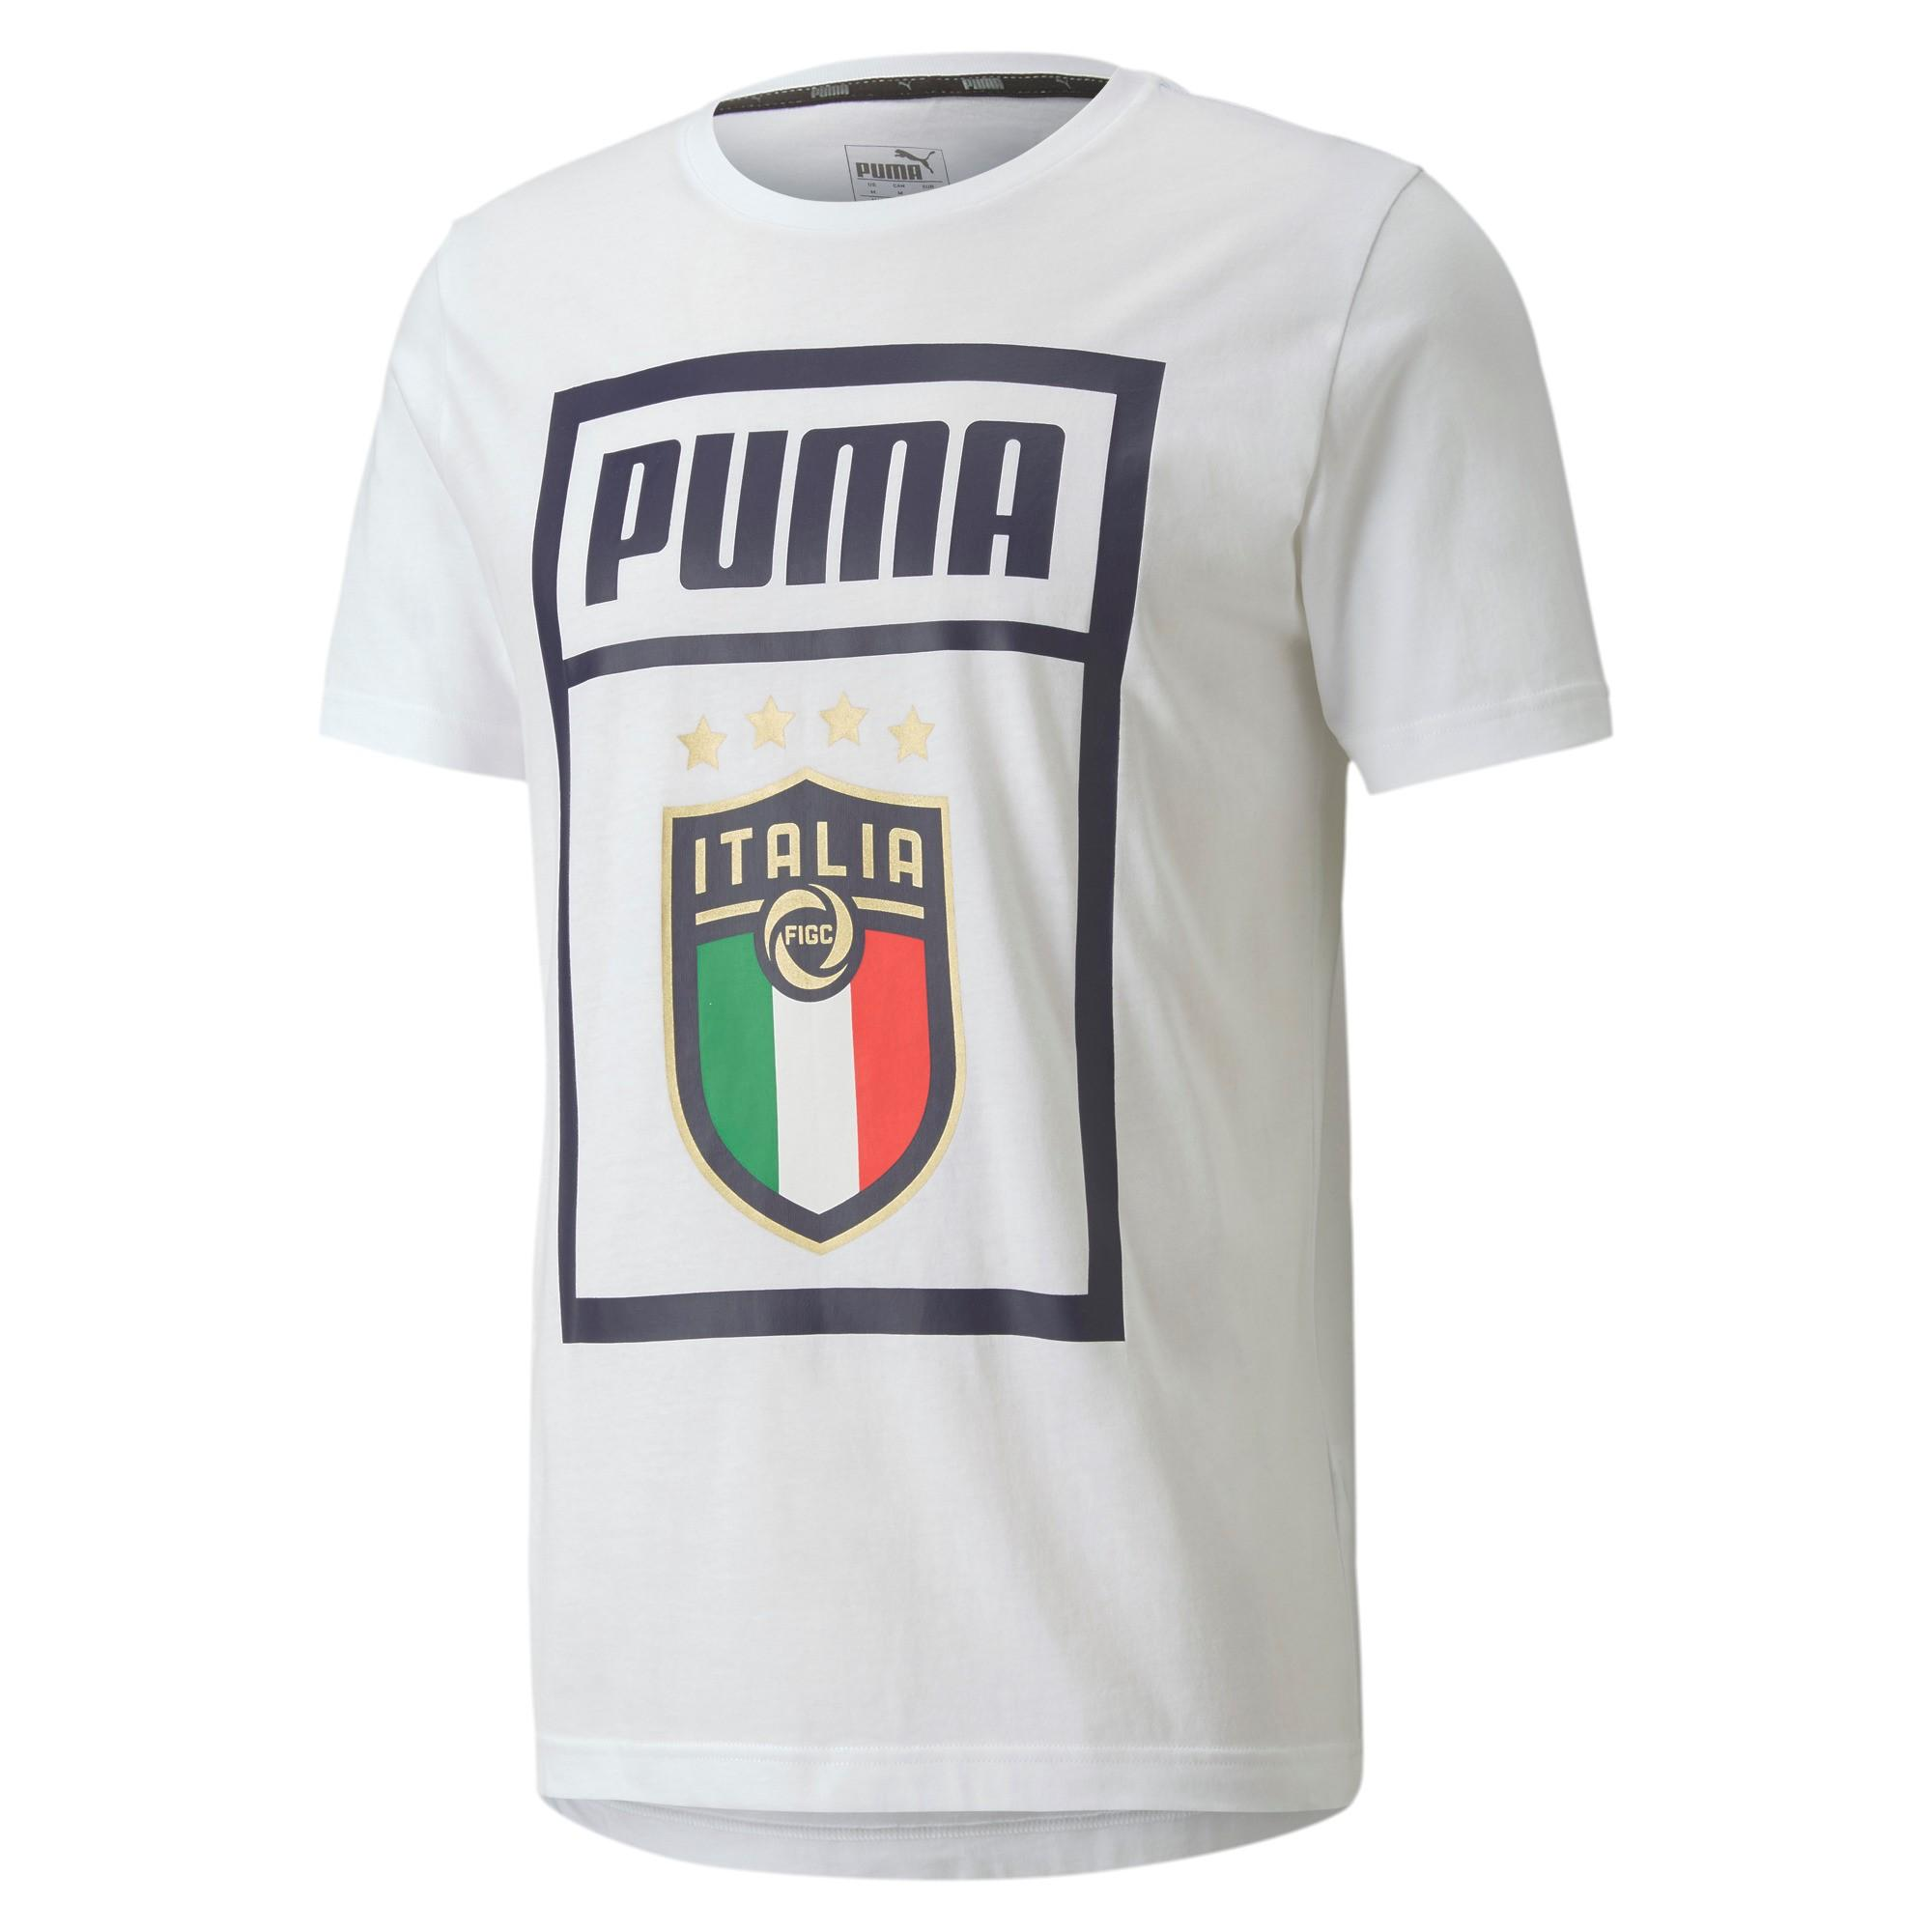 Puma T-shirt Dna Italia